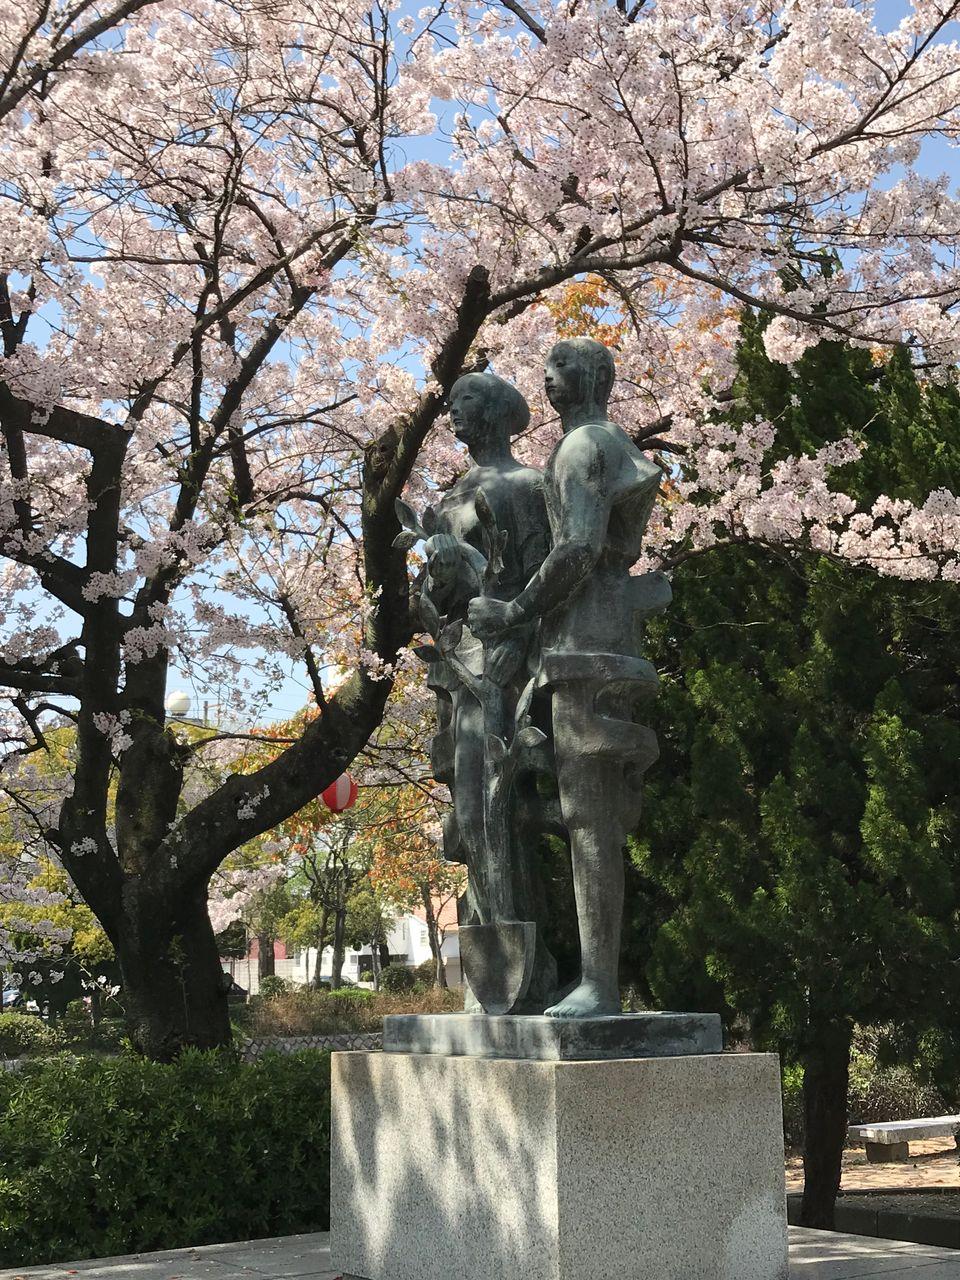 宇部税務署 周辺の桜